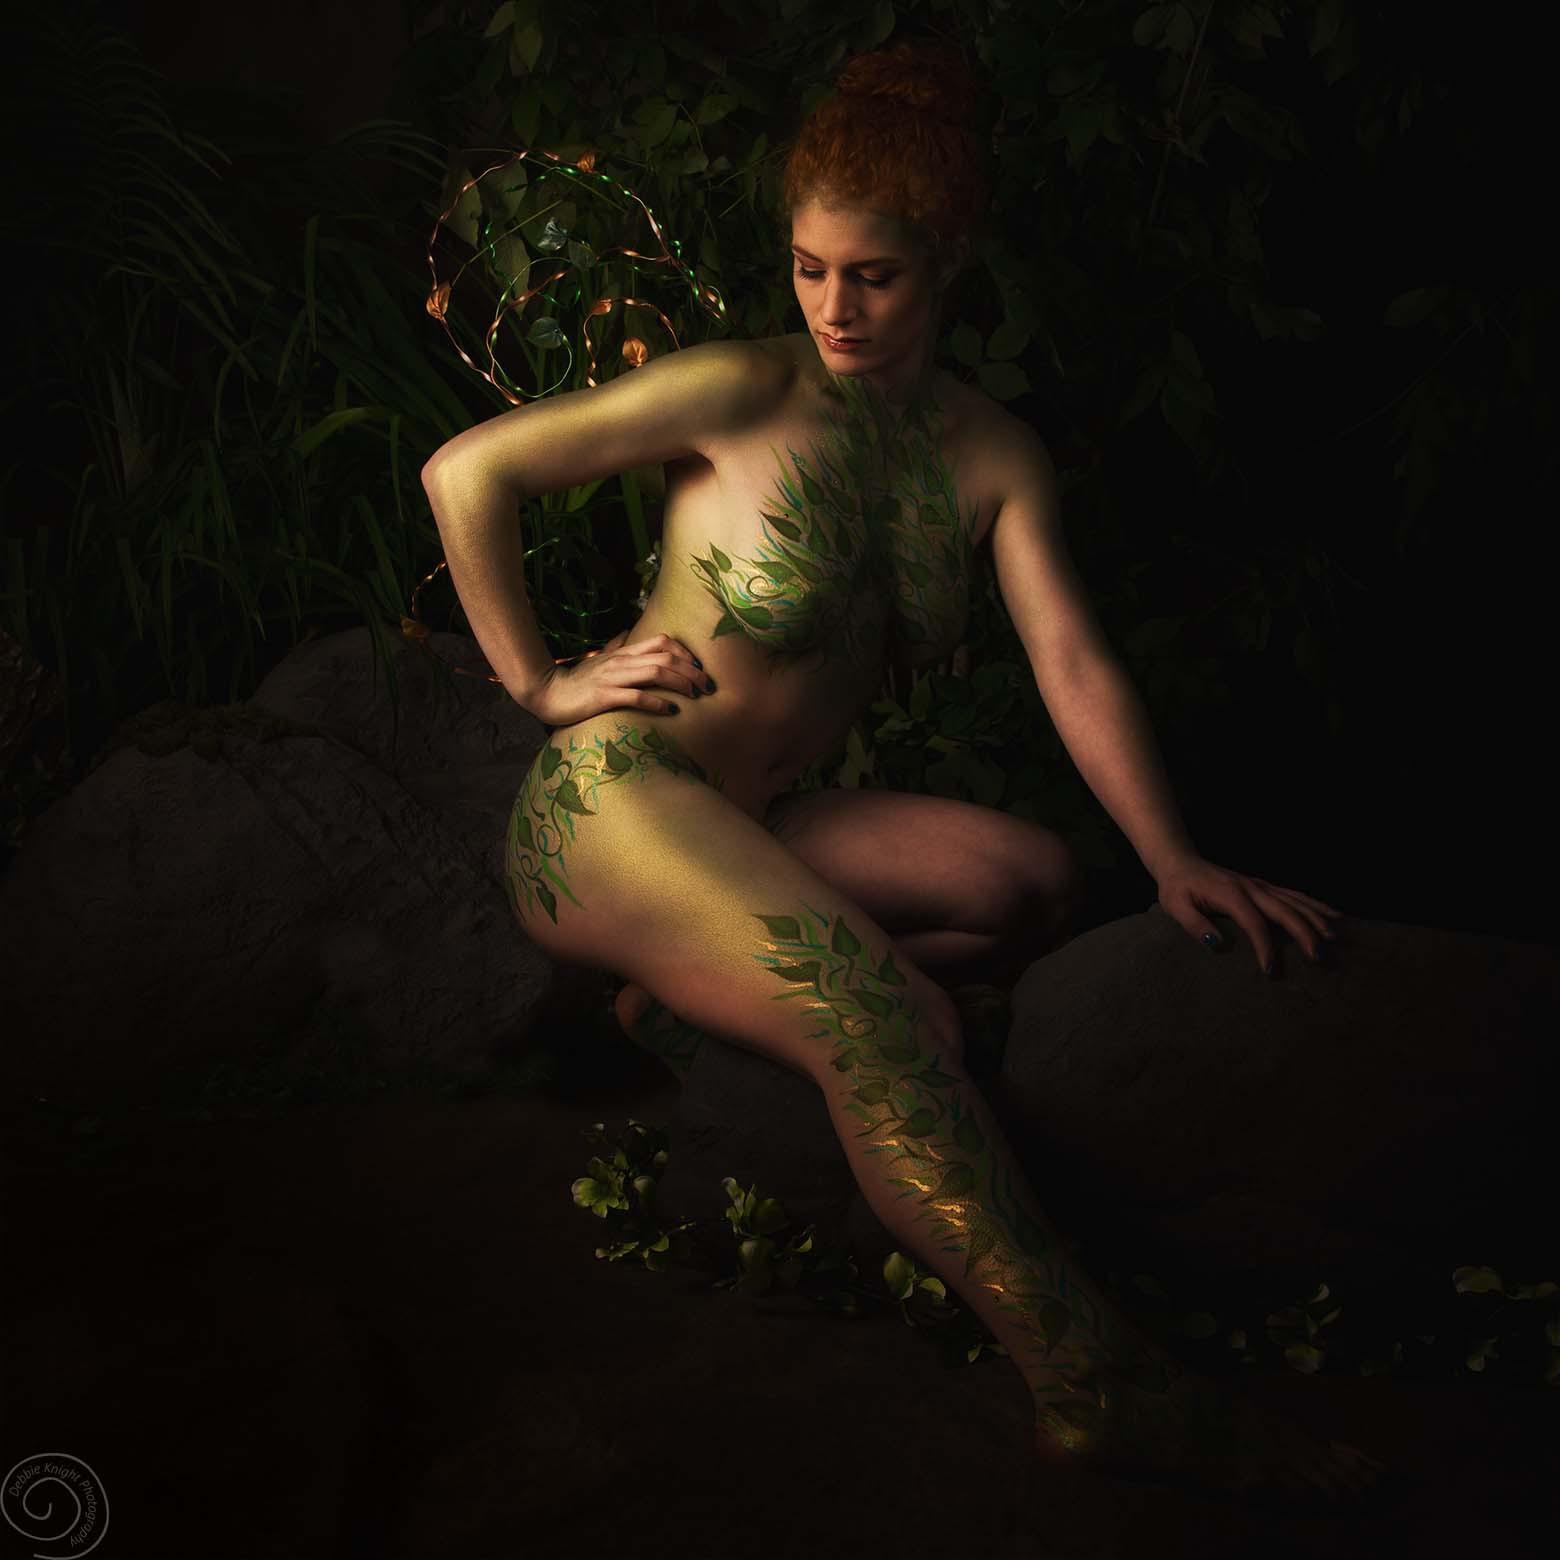 Fairy Bodypaint